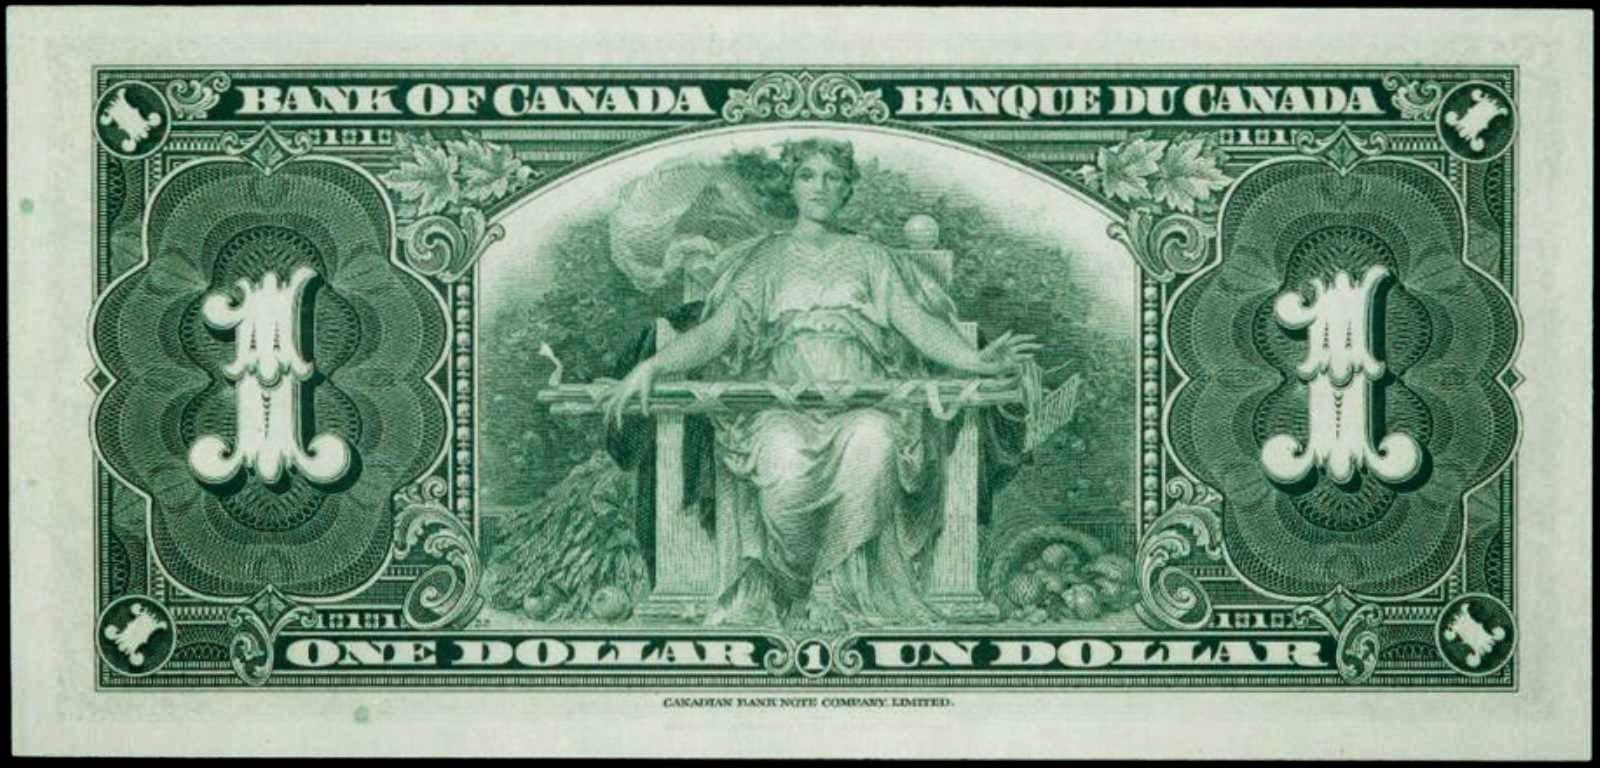 1937 Canadian one dollar bill note